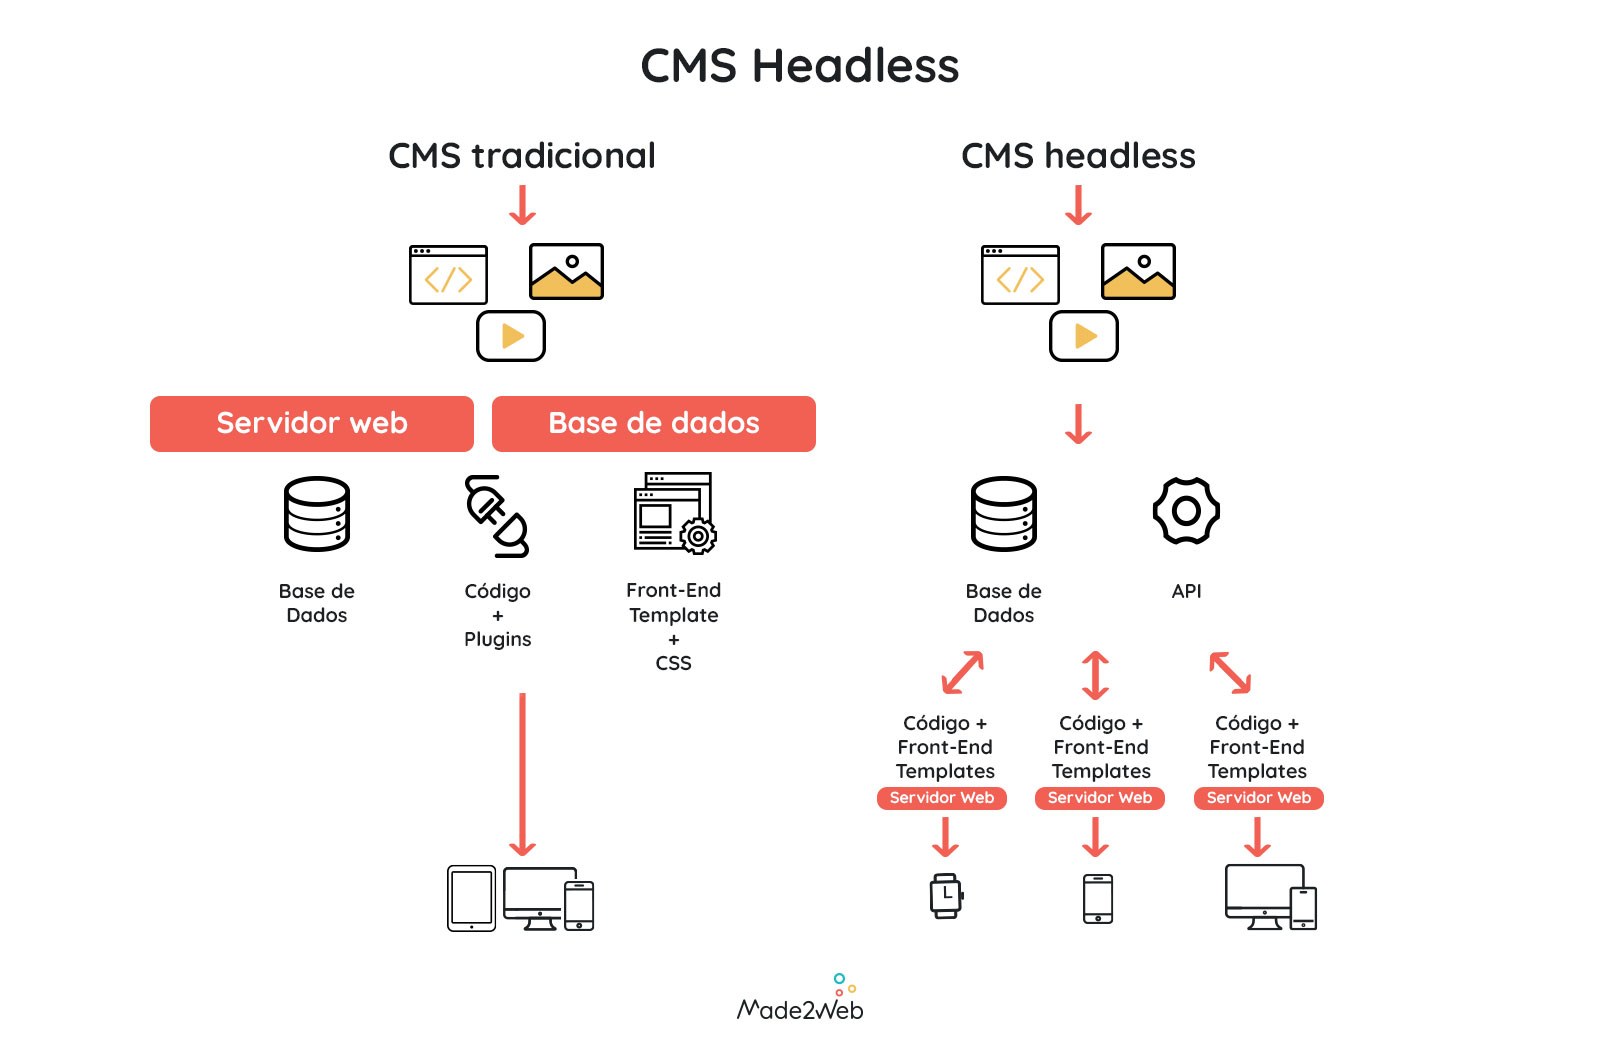 cms-headless-made2web